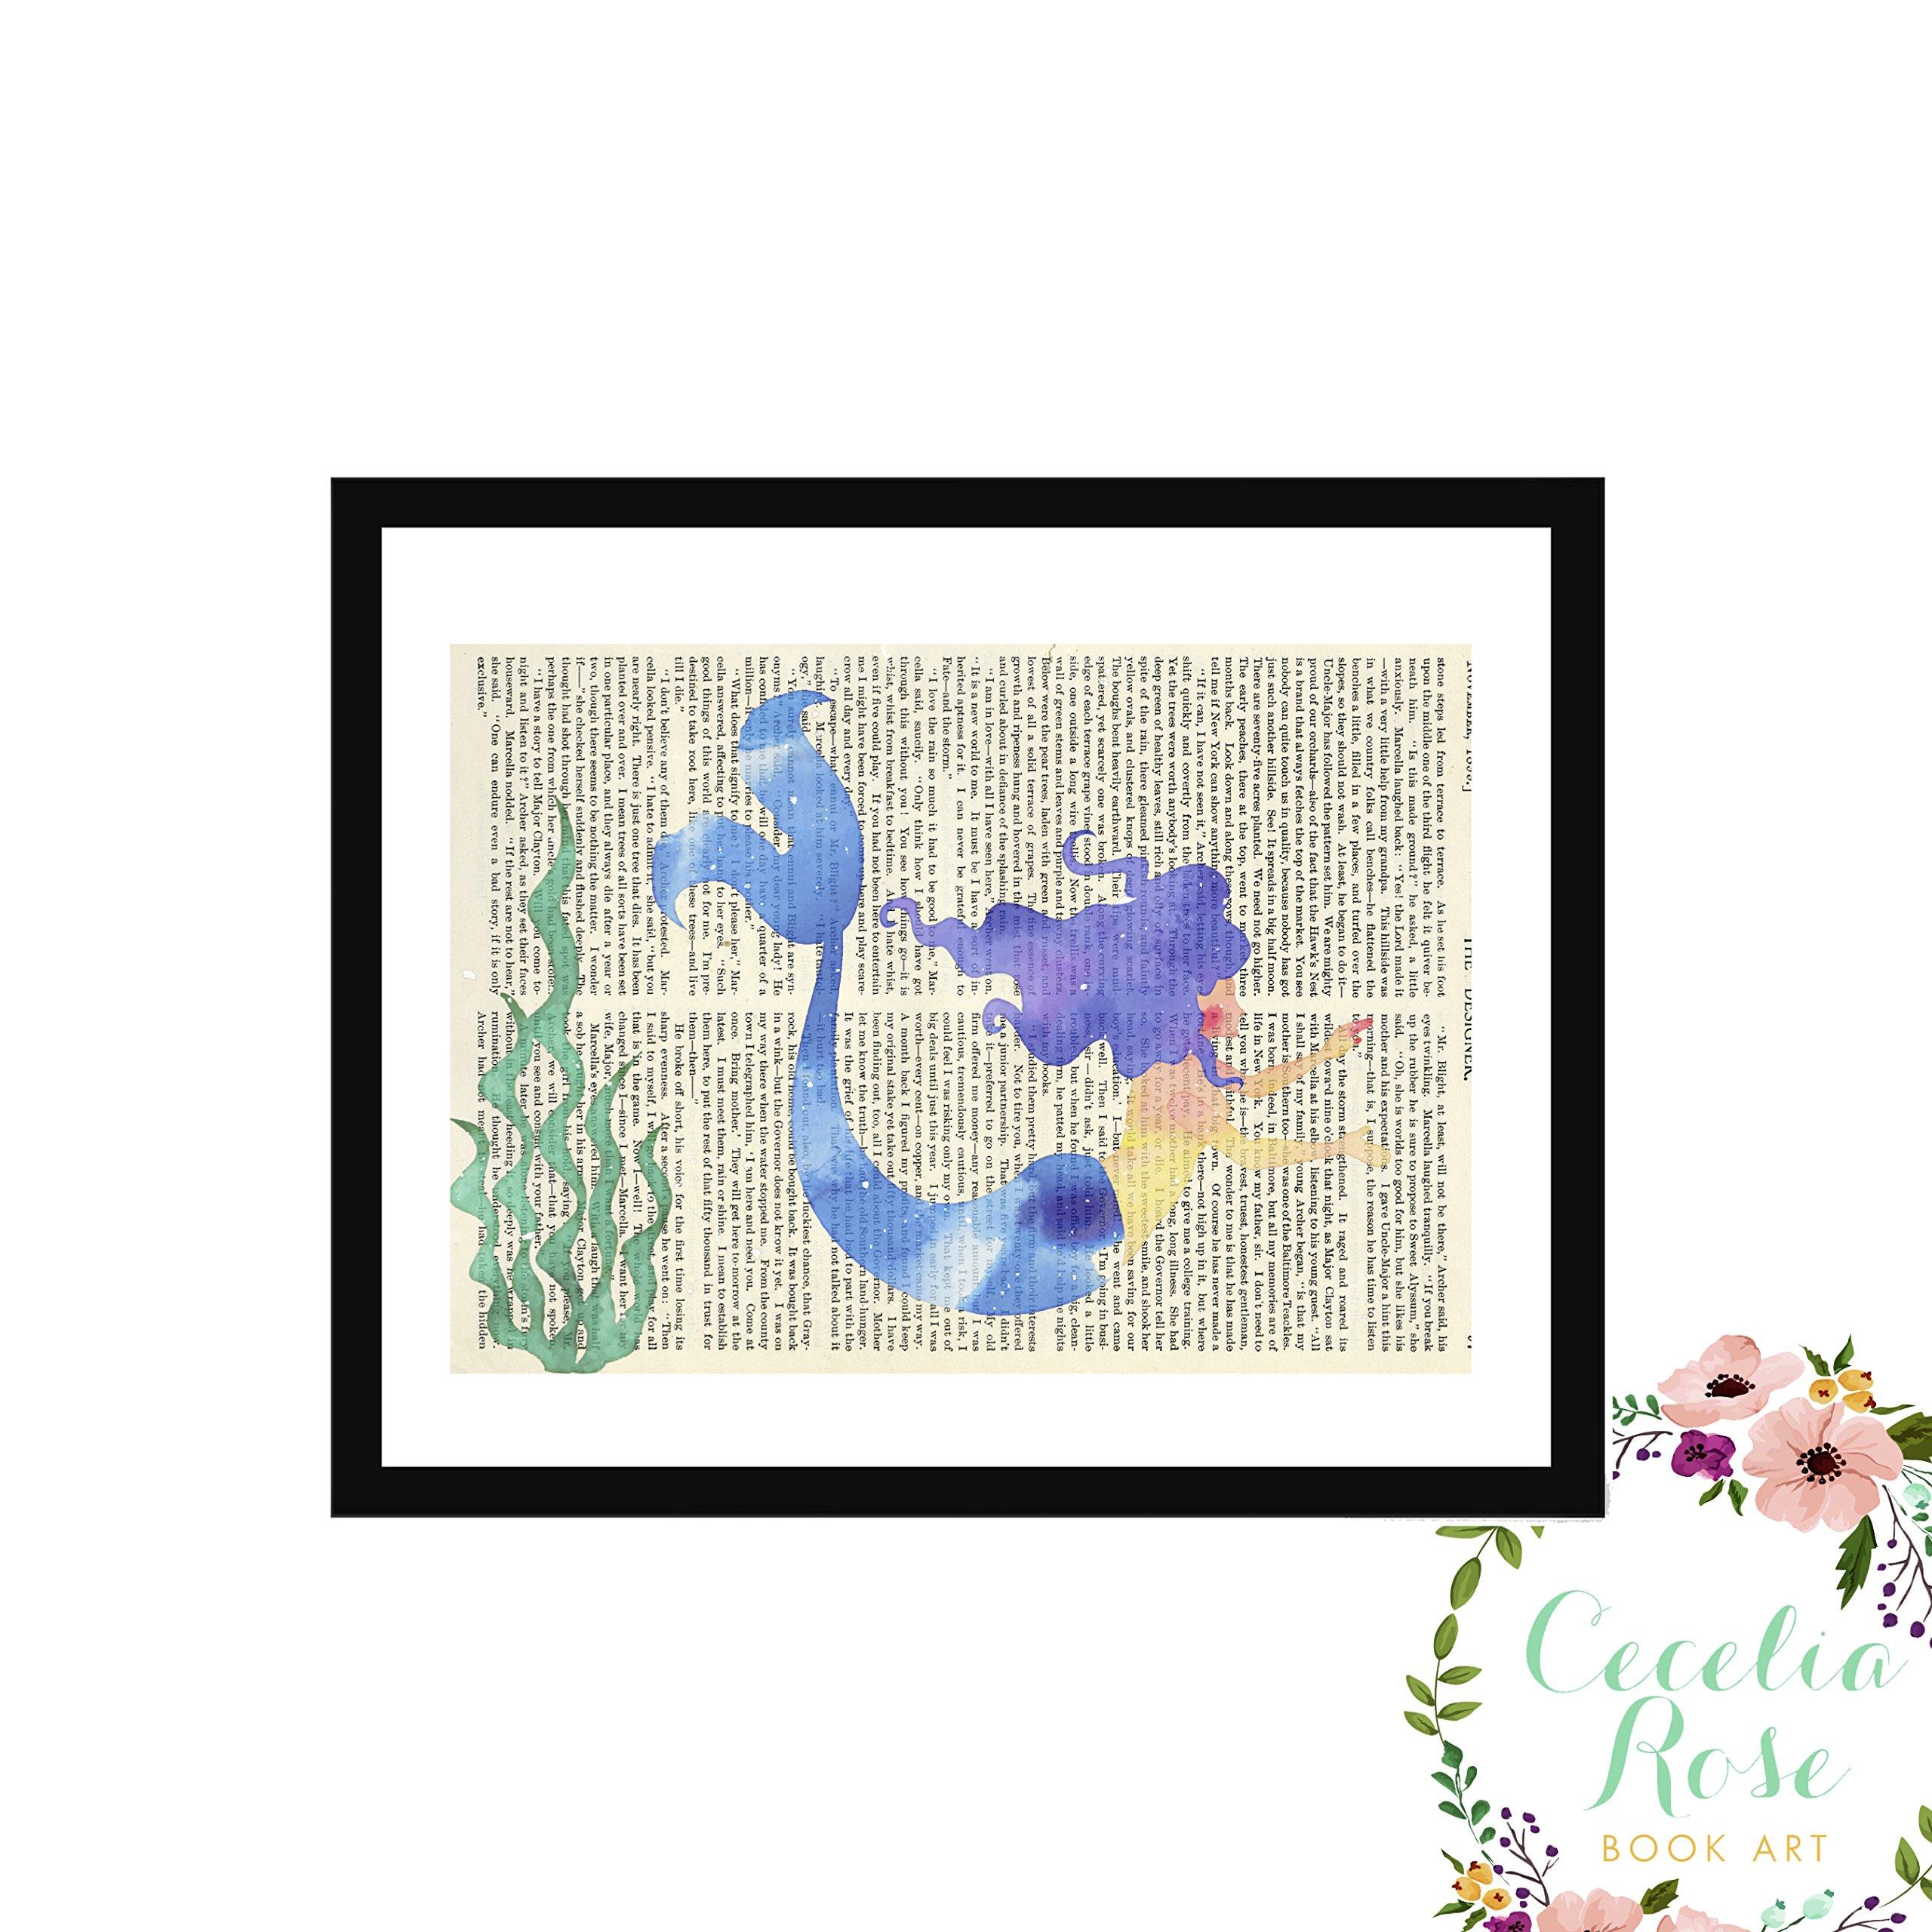 Mermaid Watercolor Seaweed Nautical Nursery Typography Farmhouse Childrens Vintage Book Page Unframed 5x7